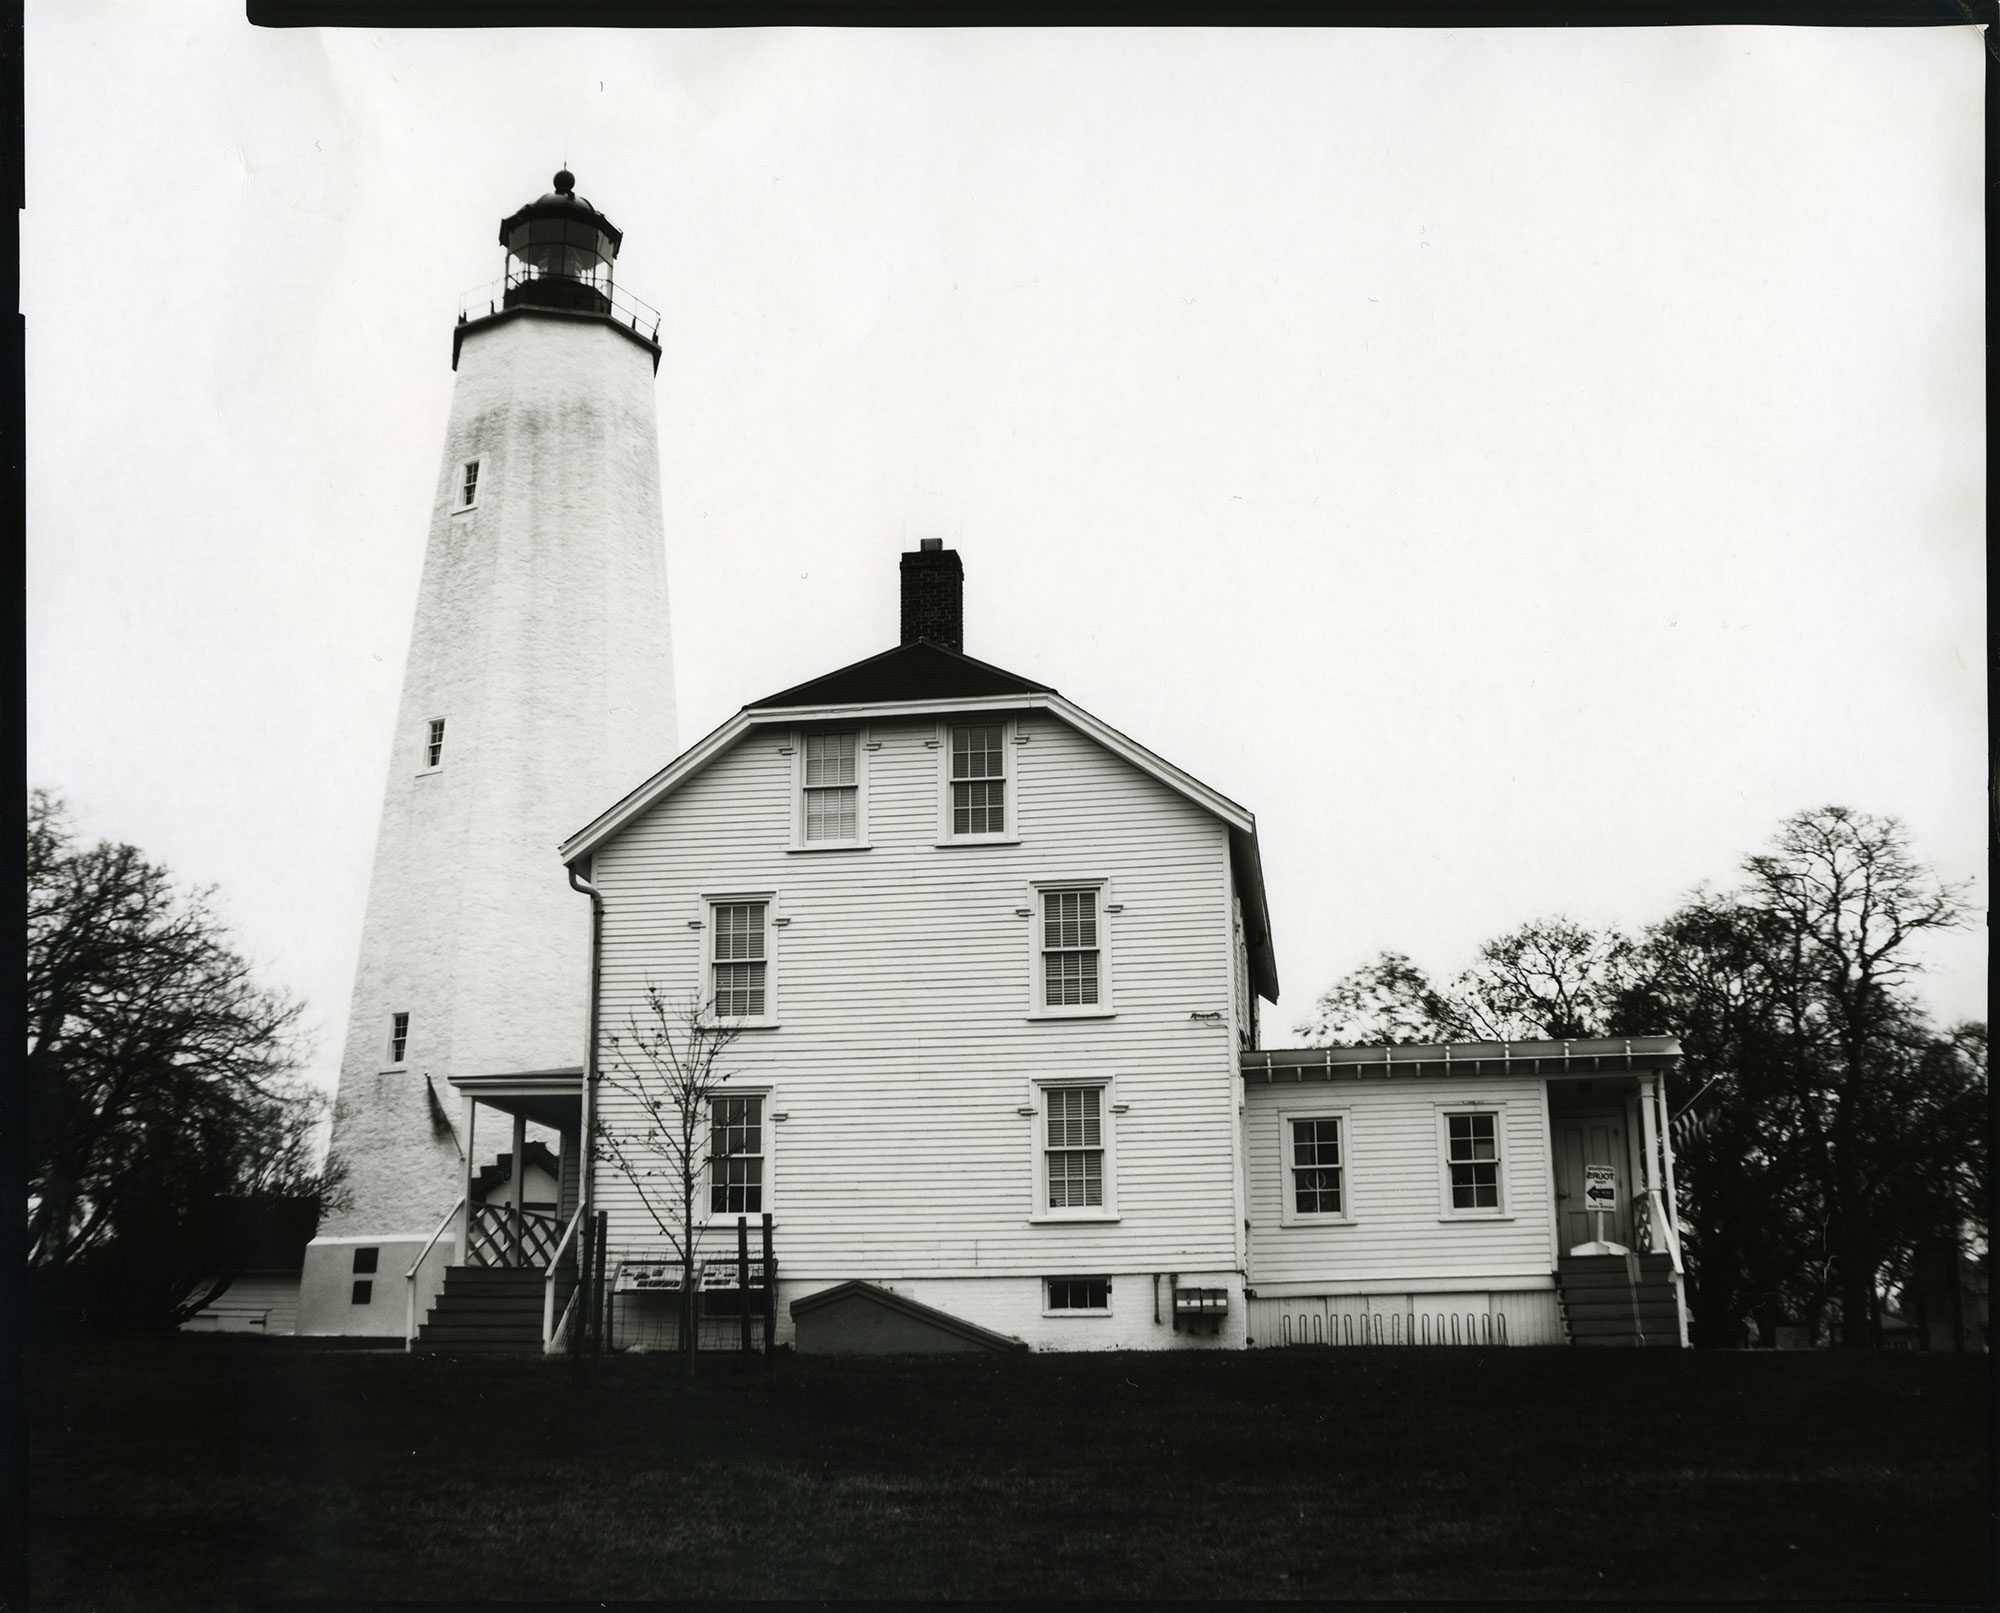 @thereisnocat Sandy Hook Lighthouse, shot on Ilford Direct Paper with an @Intrepidcamera 8x10 large format camera #shotonsheet #ilfordphoto #fridayfavourites